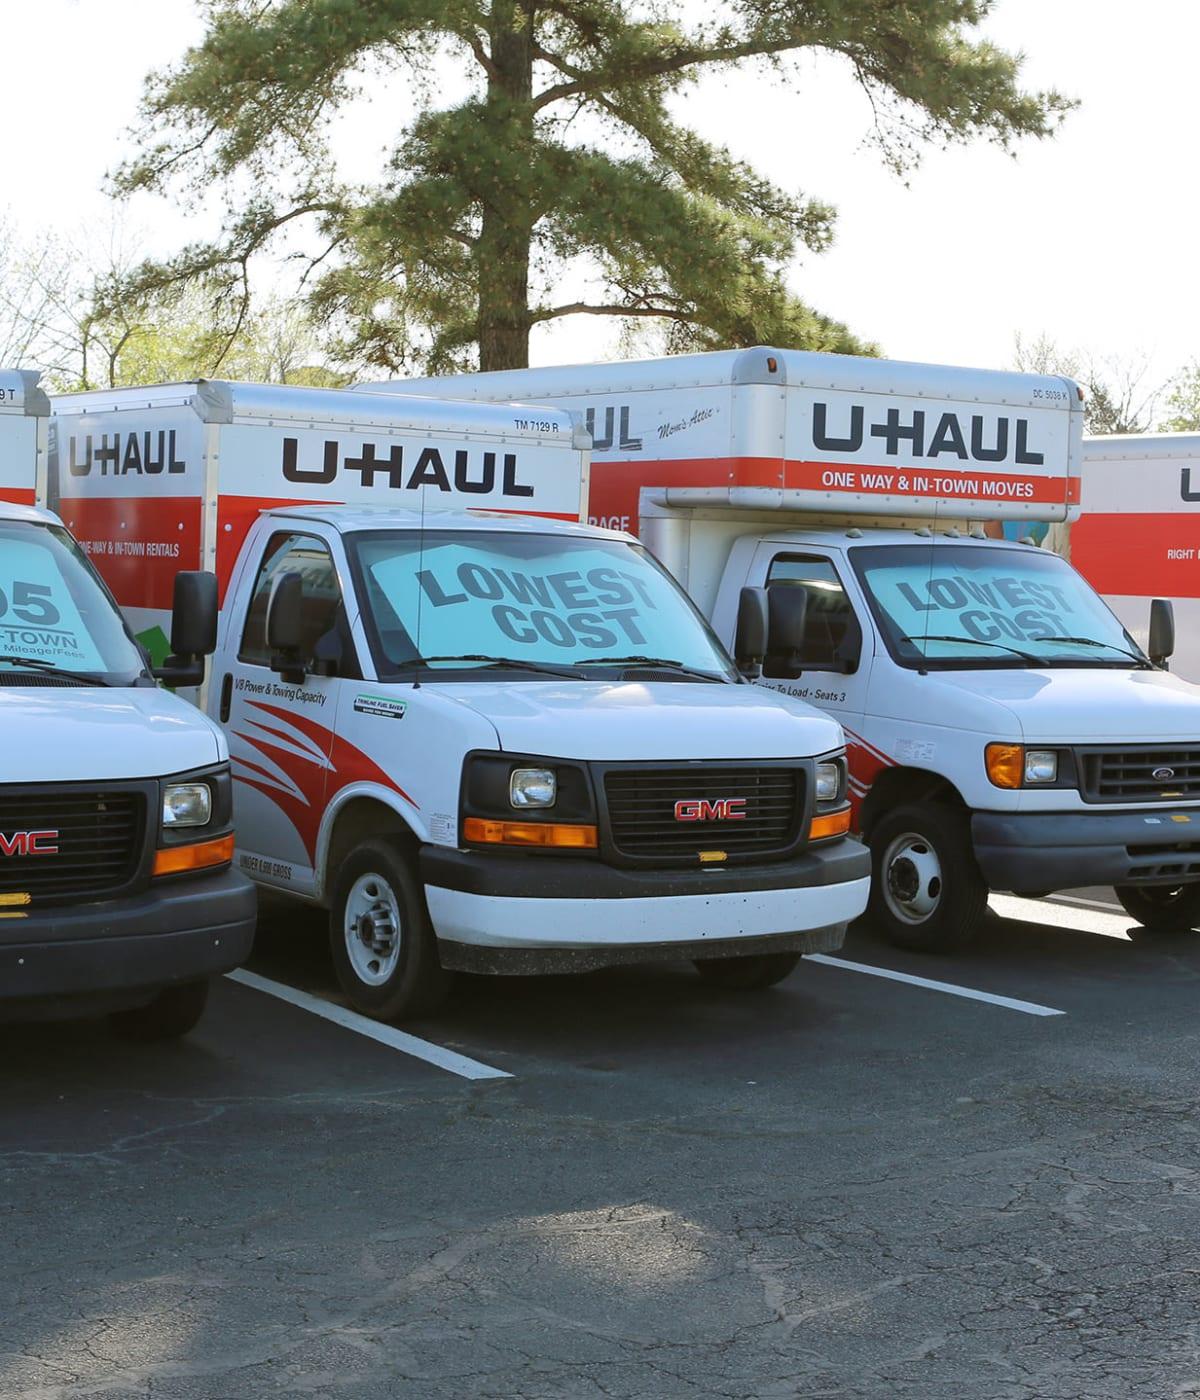 Midgard Self Storage in Savannah, Georgia, has moving trucks for rent